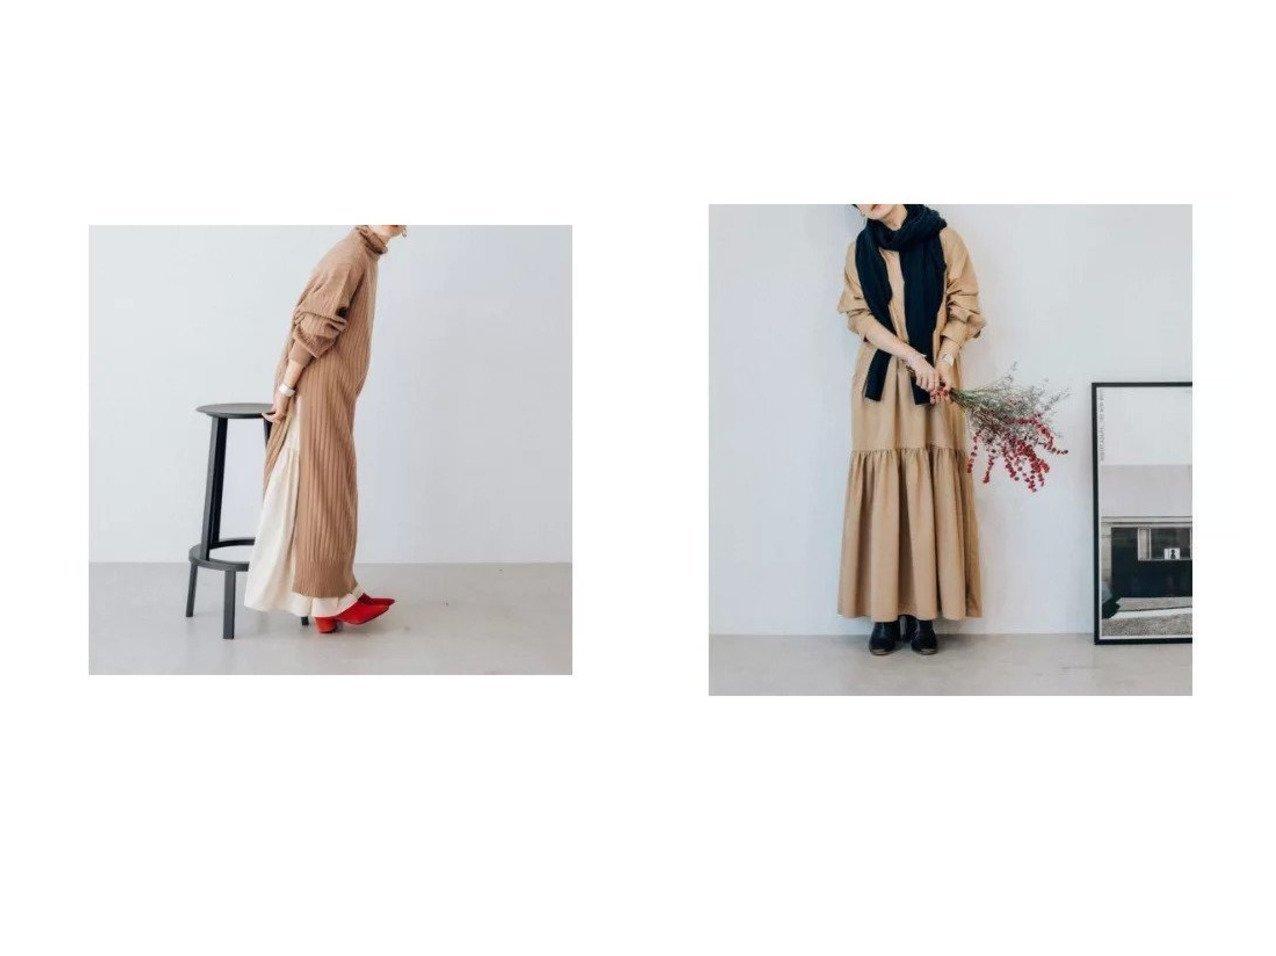 【Oblekt/オブレクト】のヘムギャザーワンピース&リブタートルスリットワンピース ワンピース・ドレスのおすすめ!人気、トレンド・レディースファッションの通販  おすすめで人気の流行・トレンド、ファッションの通販商品 メンズファッション・キッズファッション・インテリア・家具・レディースファッション・服の通販 founy(ファニー) https://founy.com/ ファッション Fashion レディースファッション WOMEN ワンピース Dress ニットワンピース Knit Dresses おすすめ Recommend スリット デニム 長袖 |ID:crp329100000022764